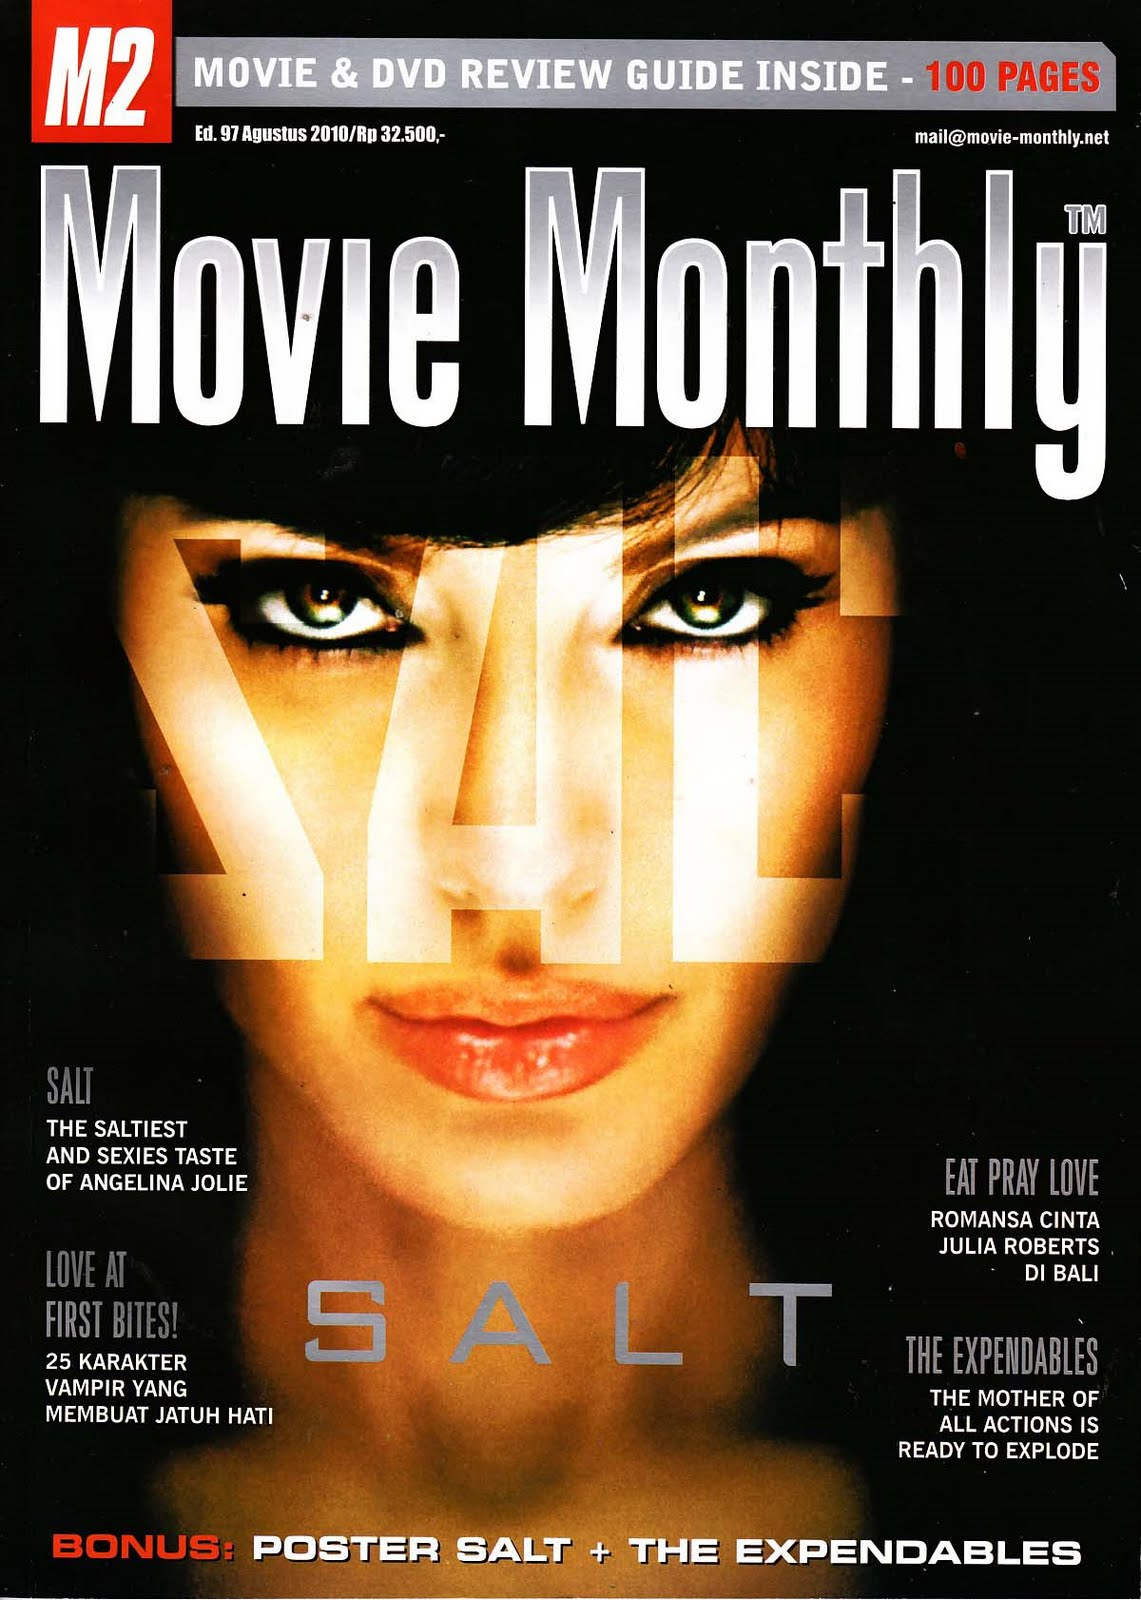 http://3.bp.blogspot.com/_Bum56WgXt9k/TH--dcBwTcI/AAAAAAAAEdA/Ttj-z2tm4vM/s1600/Movie+Monthly+150+dpi.jpg